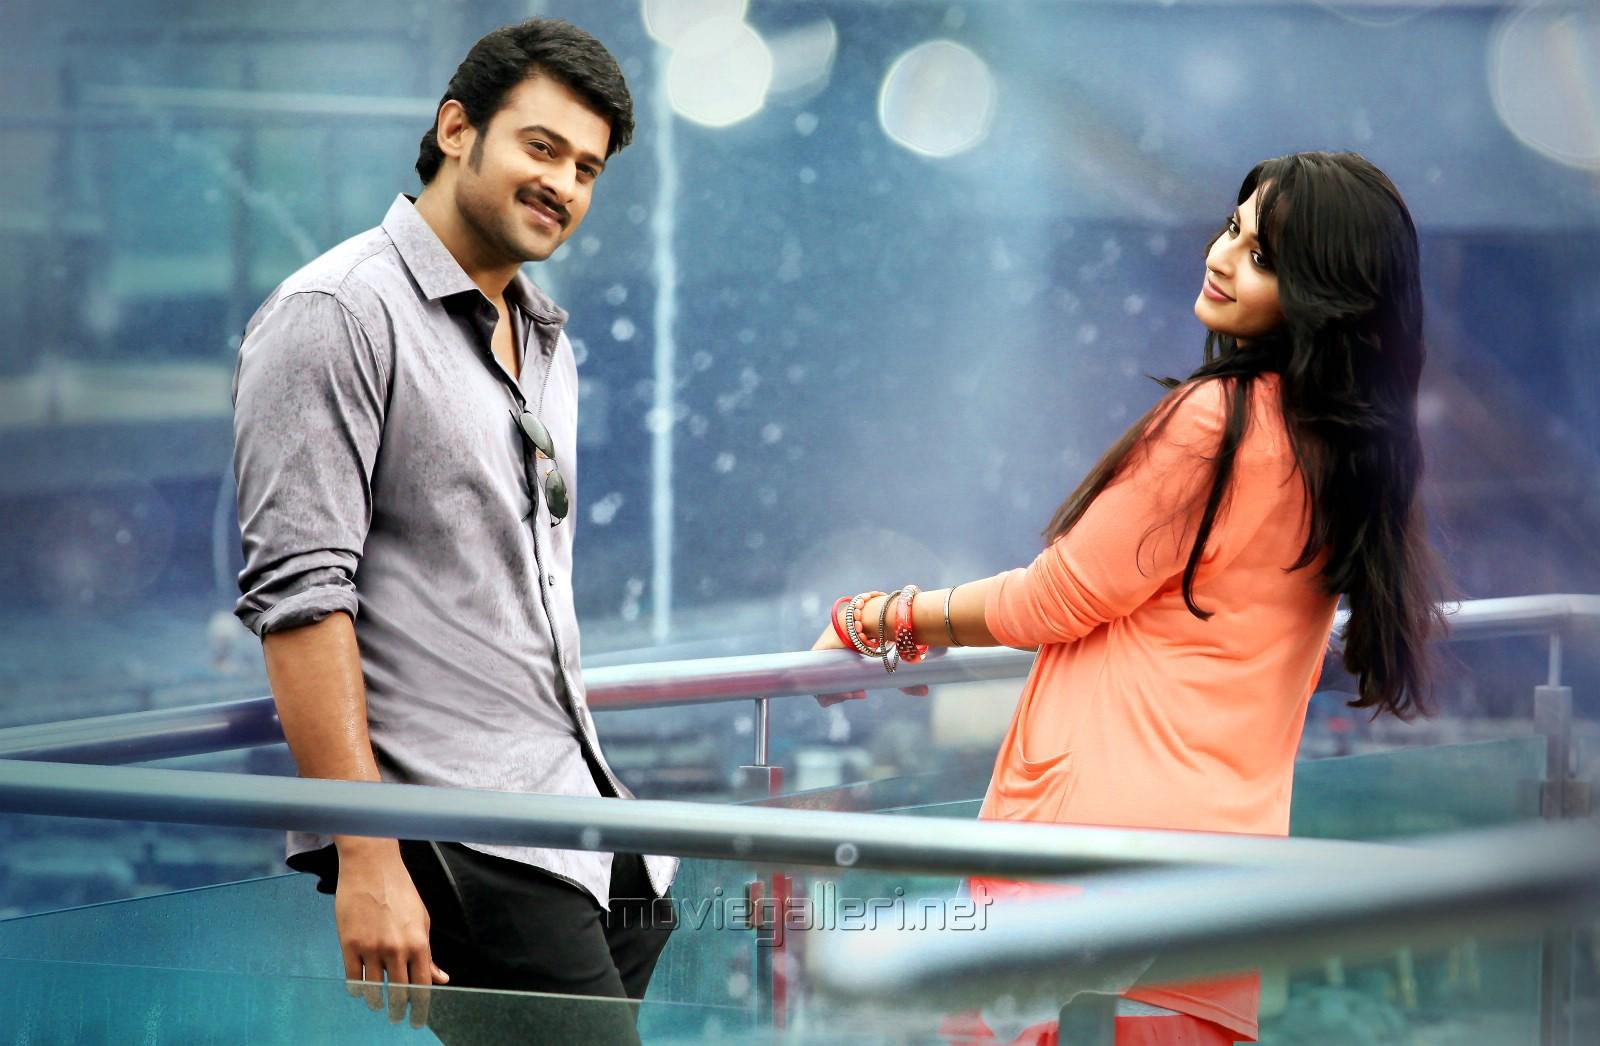 Prabhas Mirchi Telugu Movie 2013 Wallpapers Hd: Prabhas, Anushka In Mirchi Movie HD